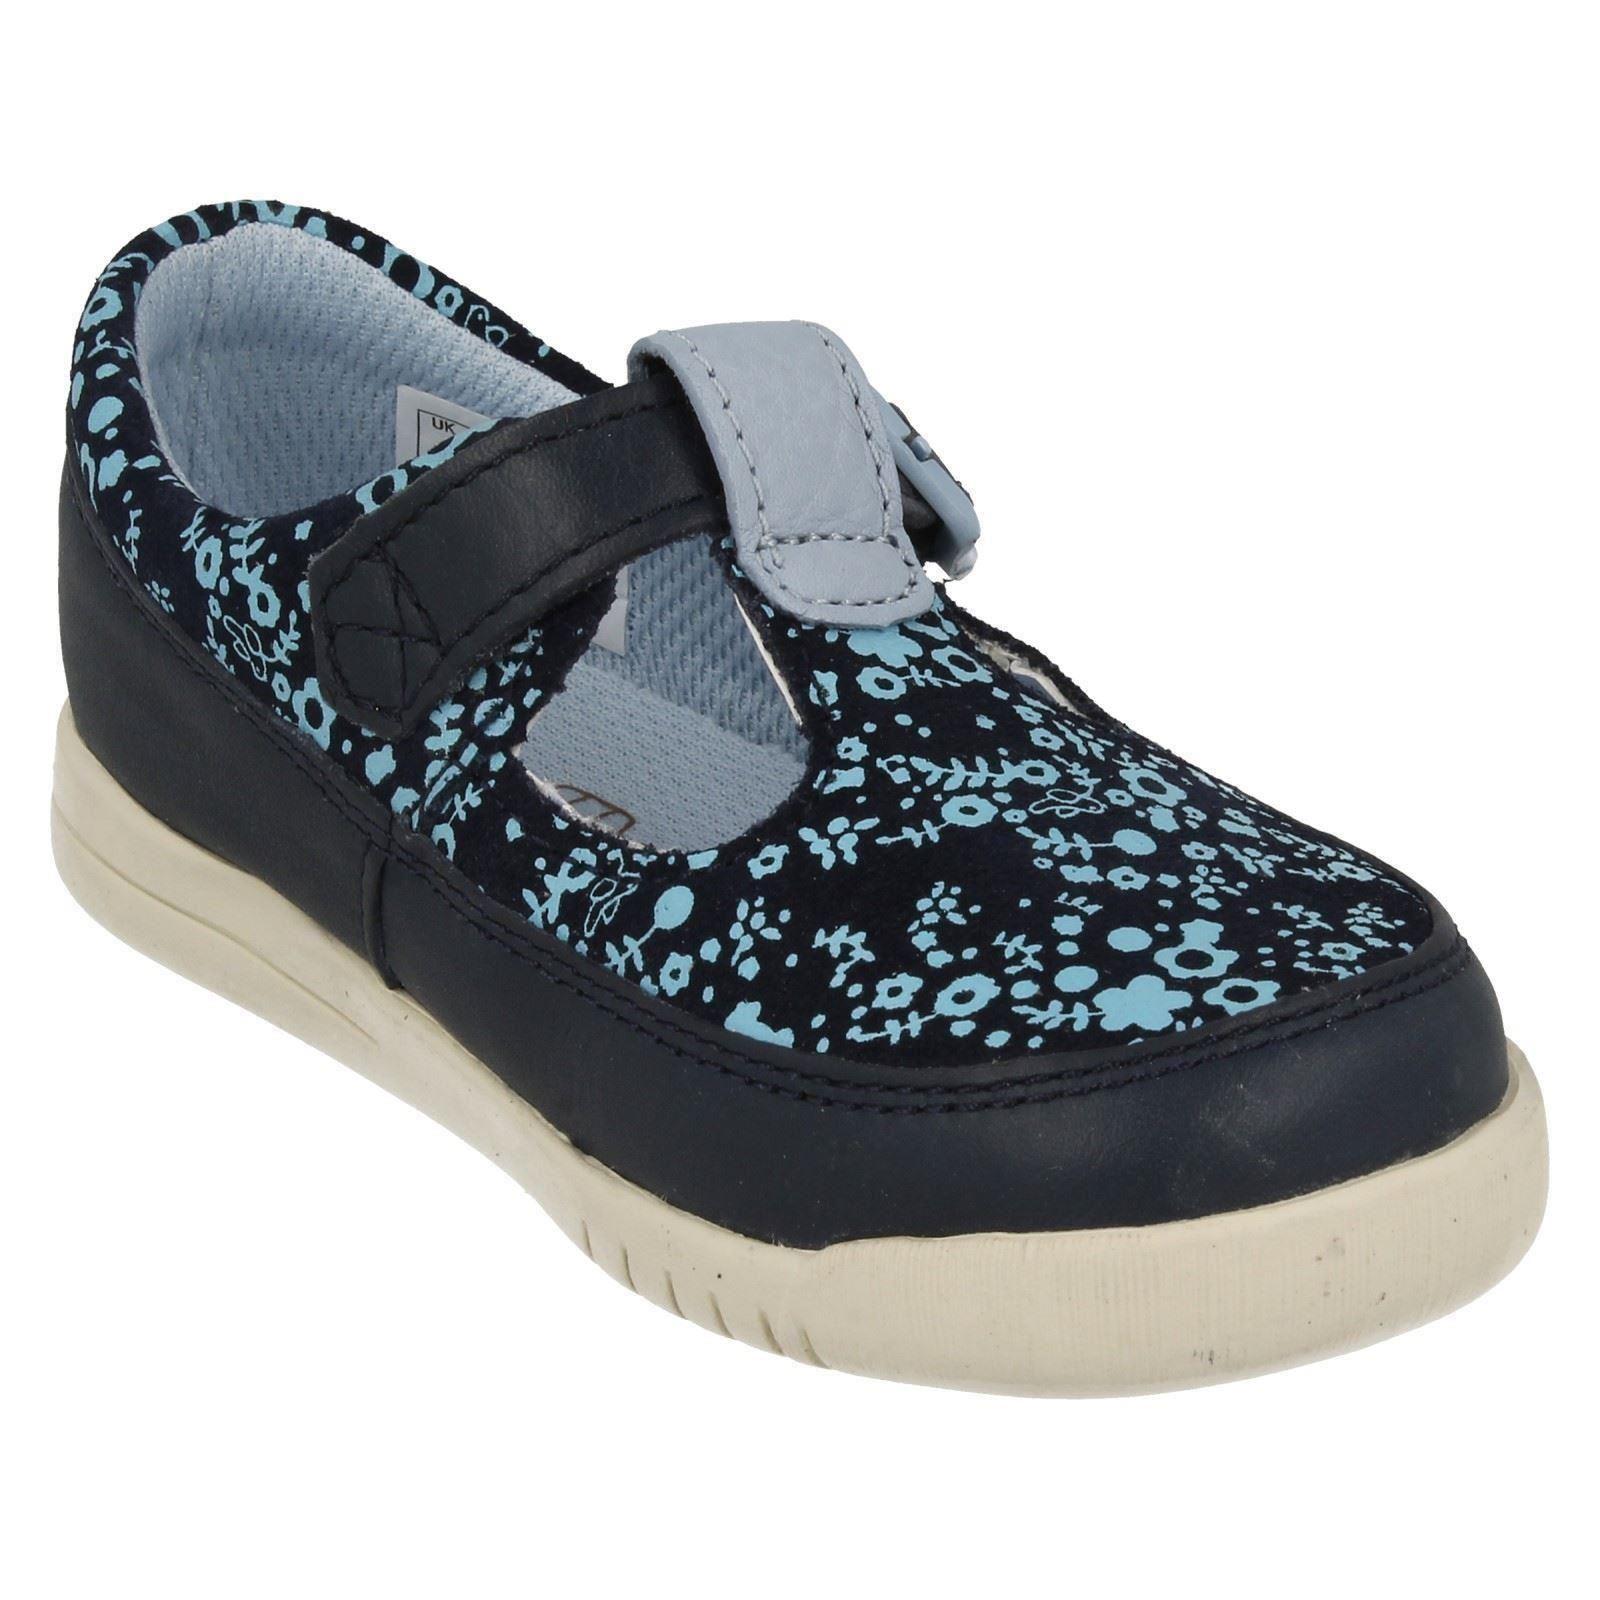 Infantil Chicas Clarks Primero Zapatos T-Bar loco cuento